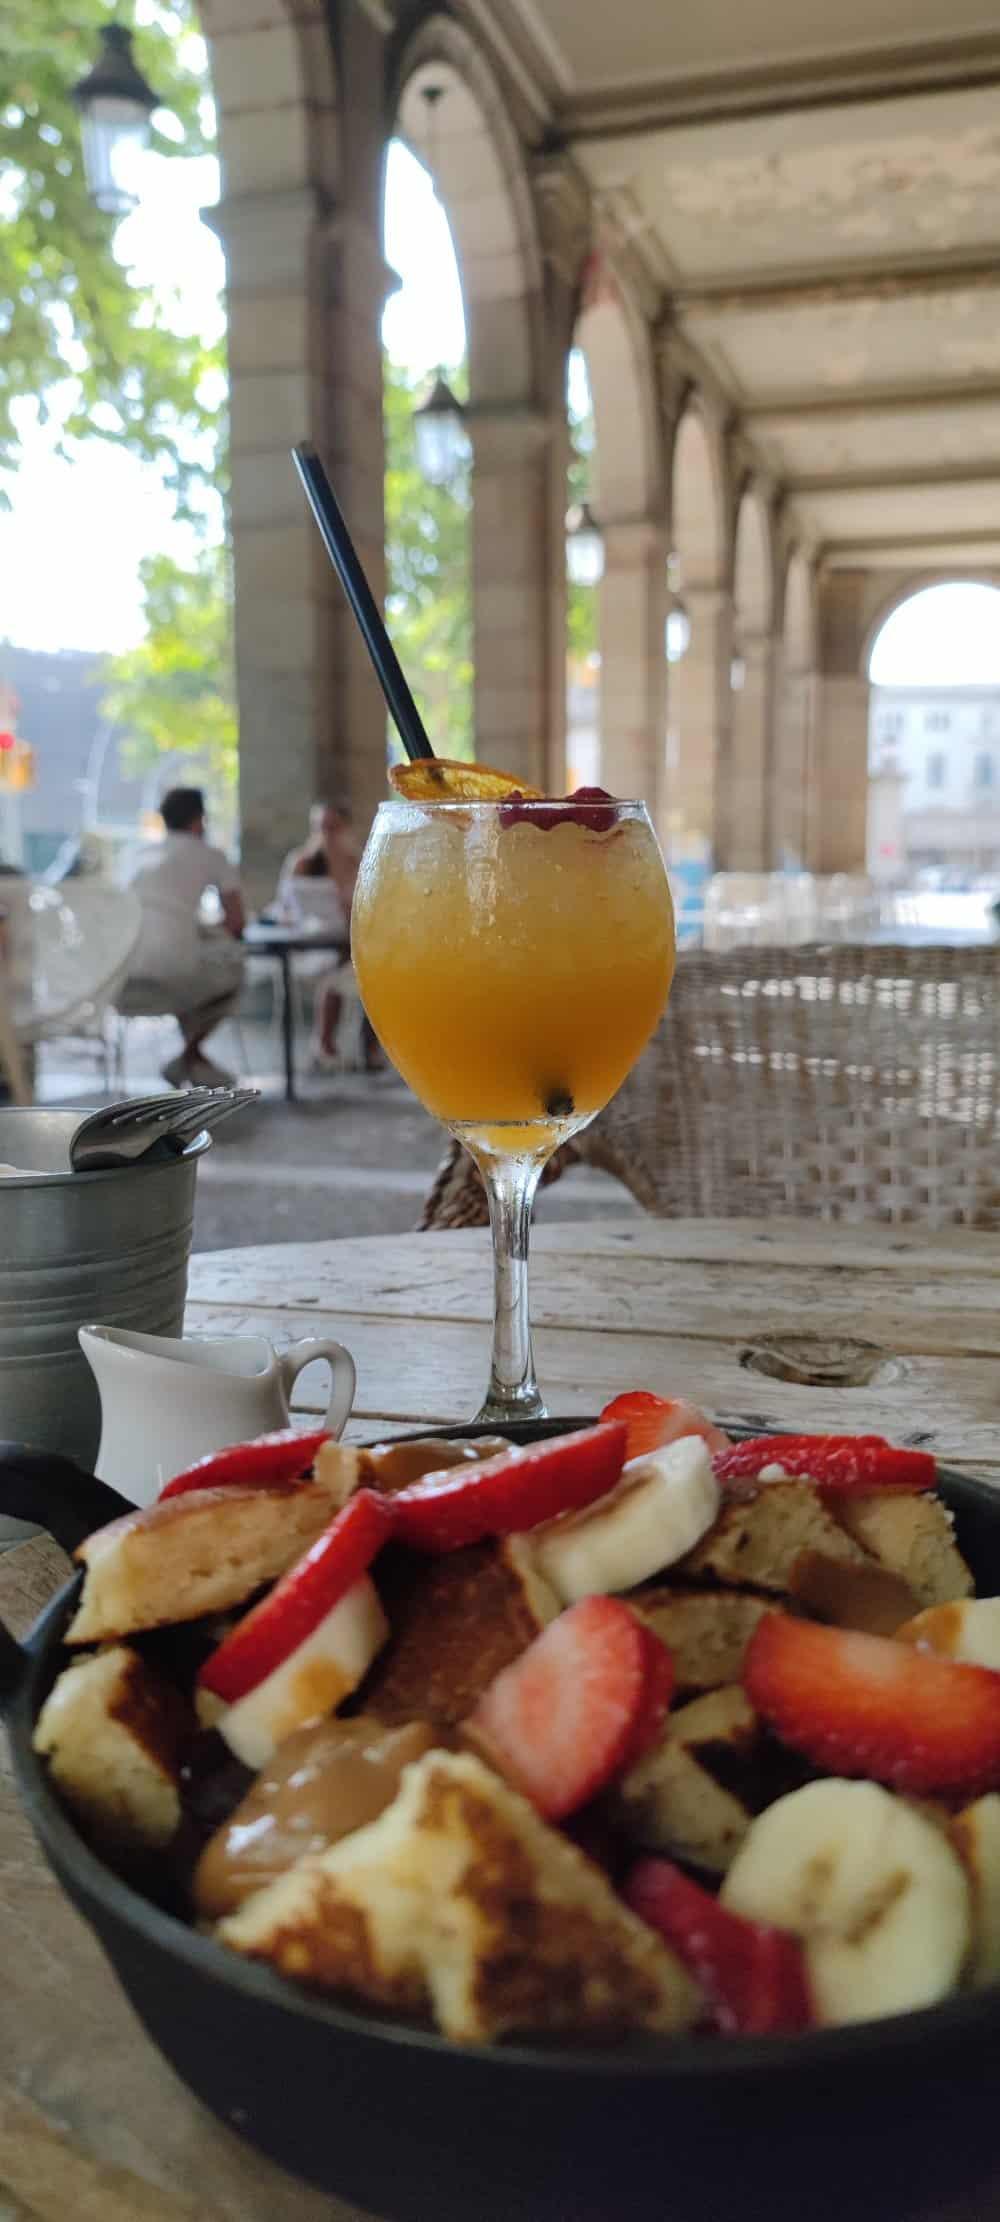 Alsur Café: Choco-Banana Kaiser Pancakes